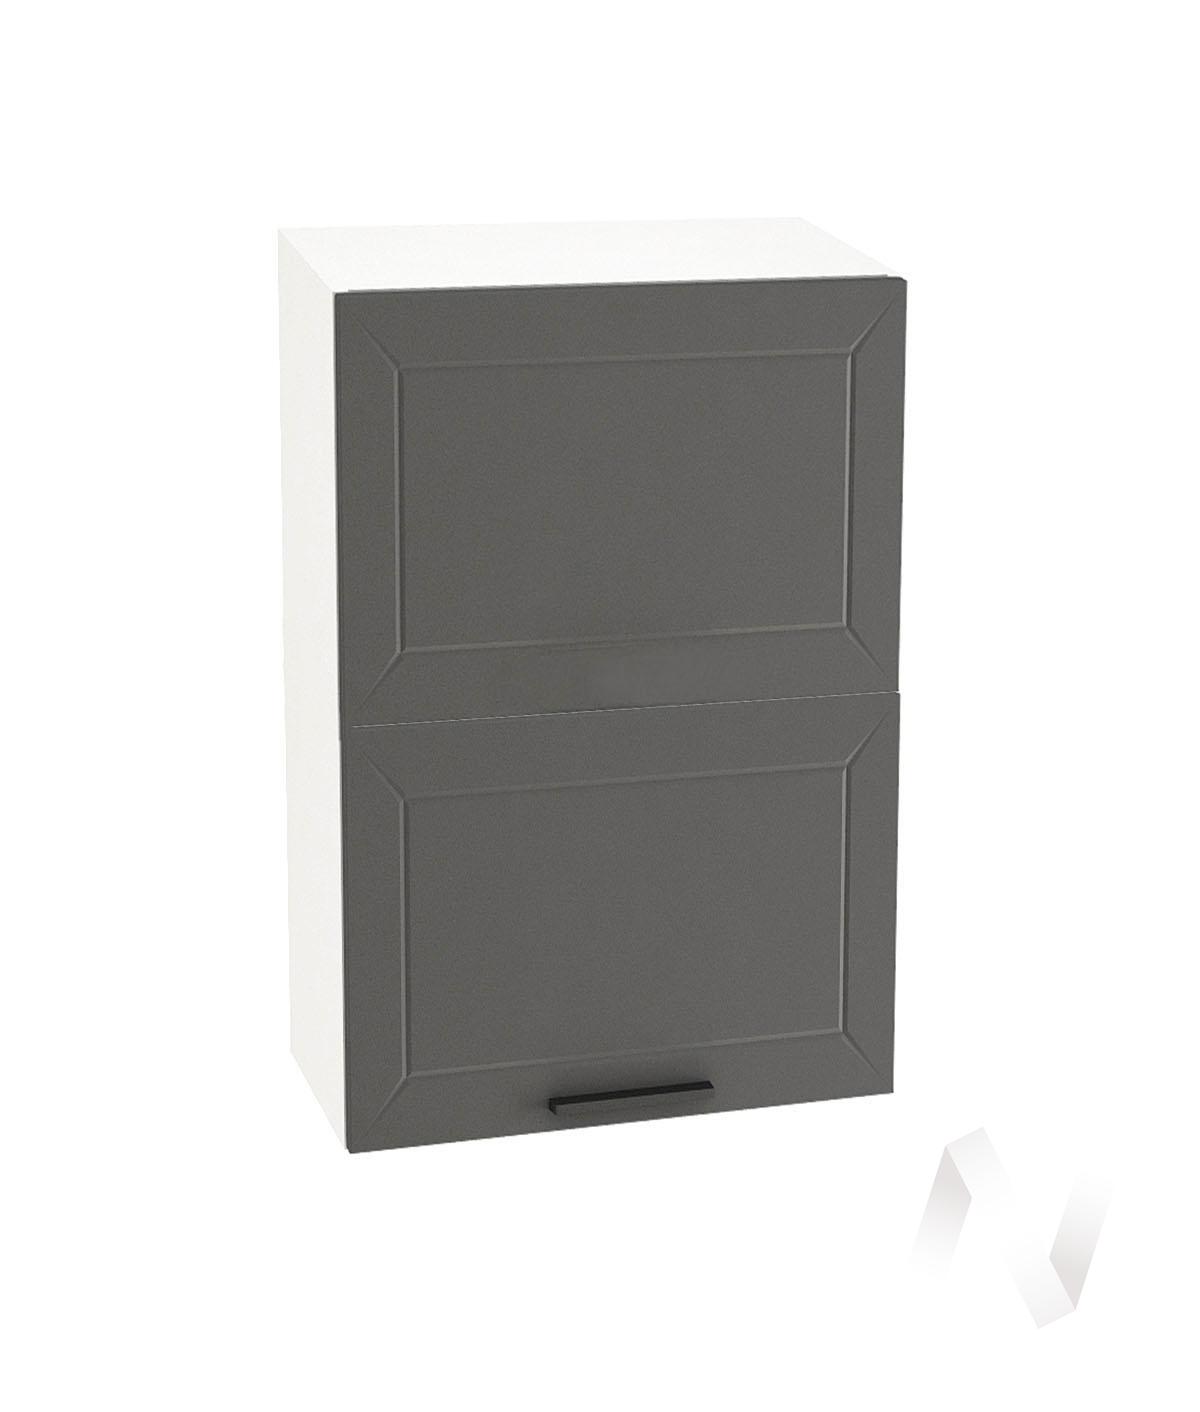 "Кухня ""Глетчер"": Шкаф верхний горизонтальный 602, ШВГ 602 (Маренго силк/корпус белый)"